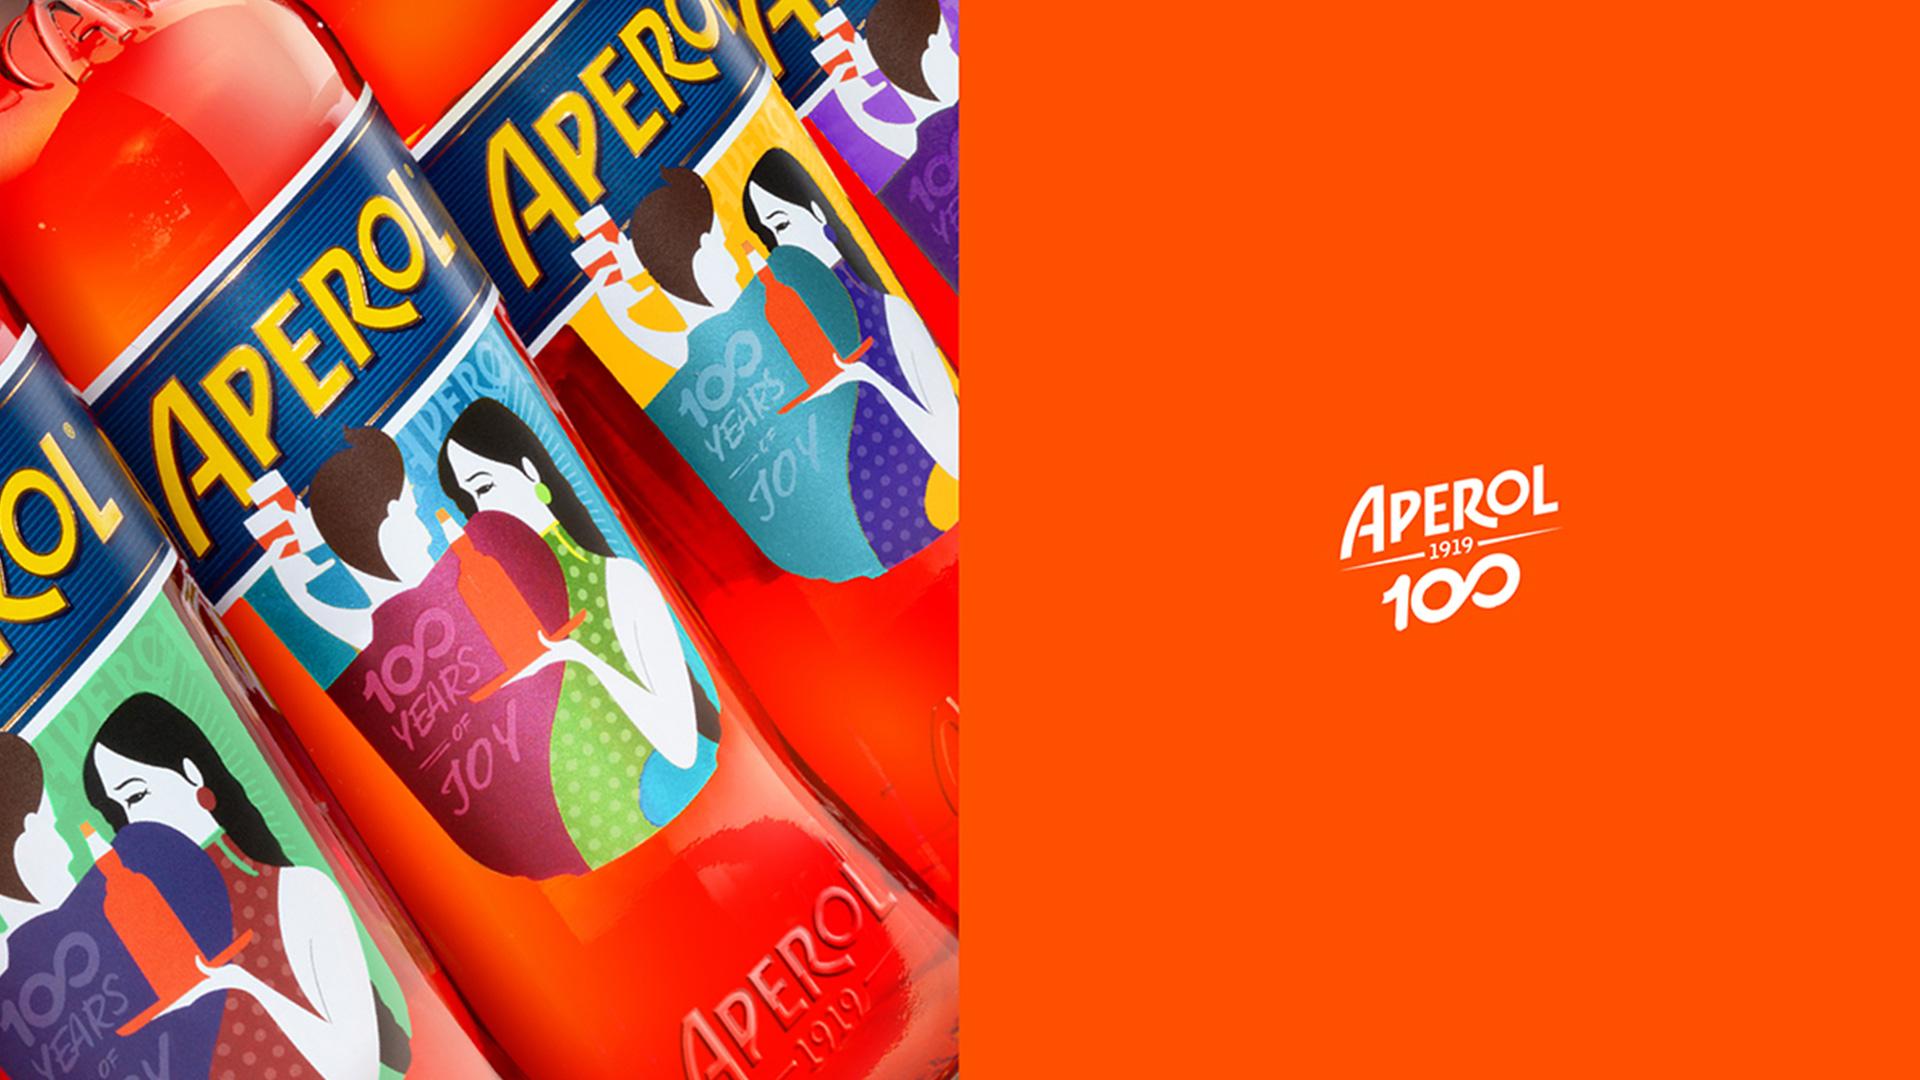 Aperol-Rba-Design-005